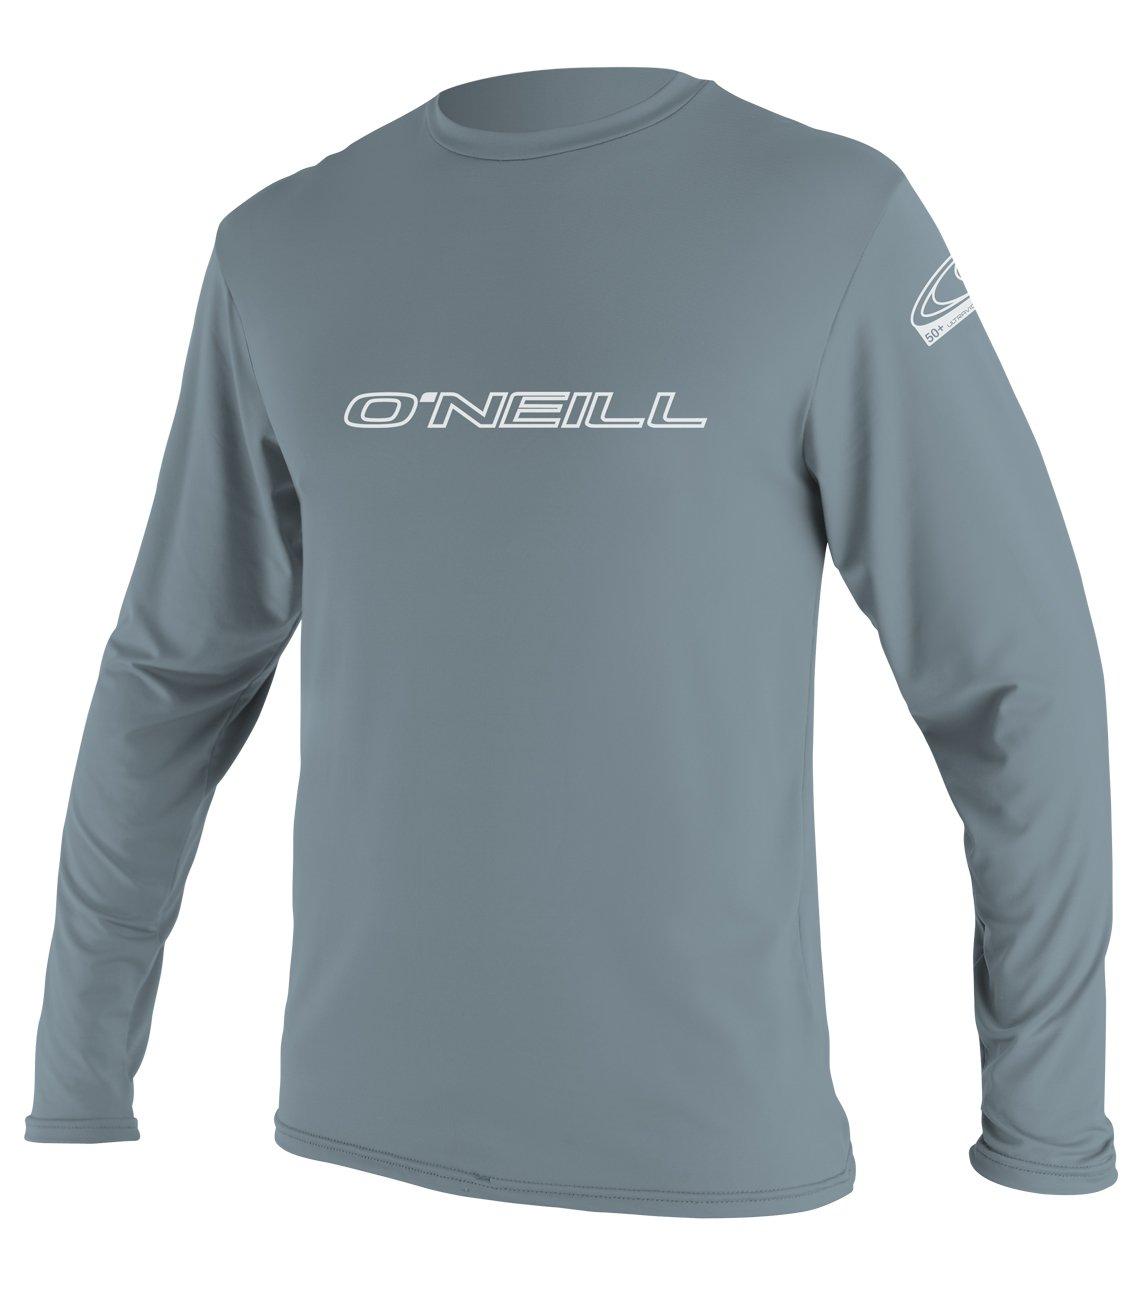 O'Neill Wetsuits Men's Basic Skins UPF 50+ Long Sleeve Sun Shirt, Dusty Blue, Medium by O'Neill Wetsuits (Image #1)